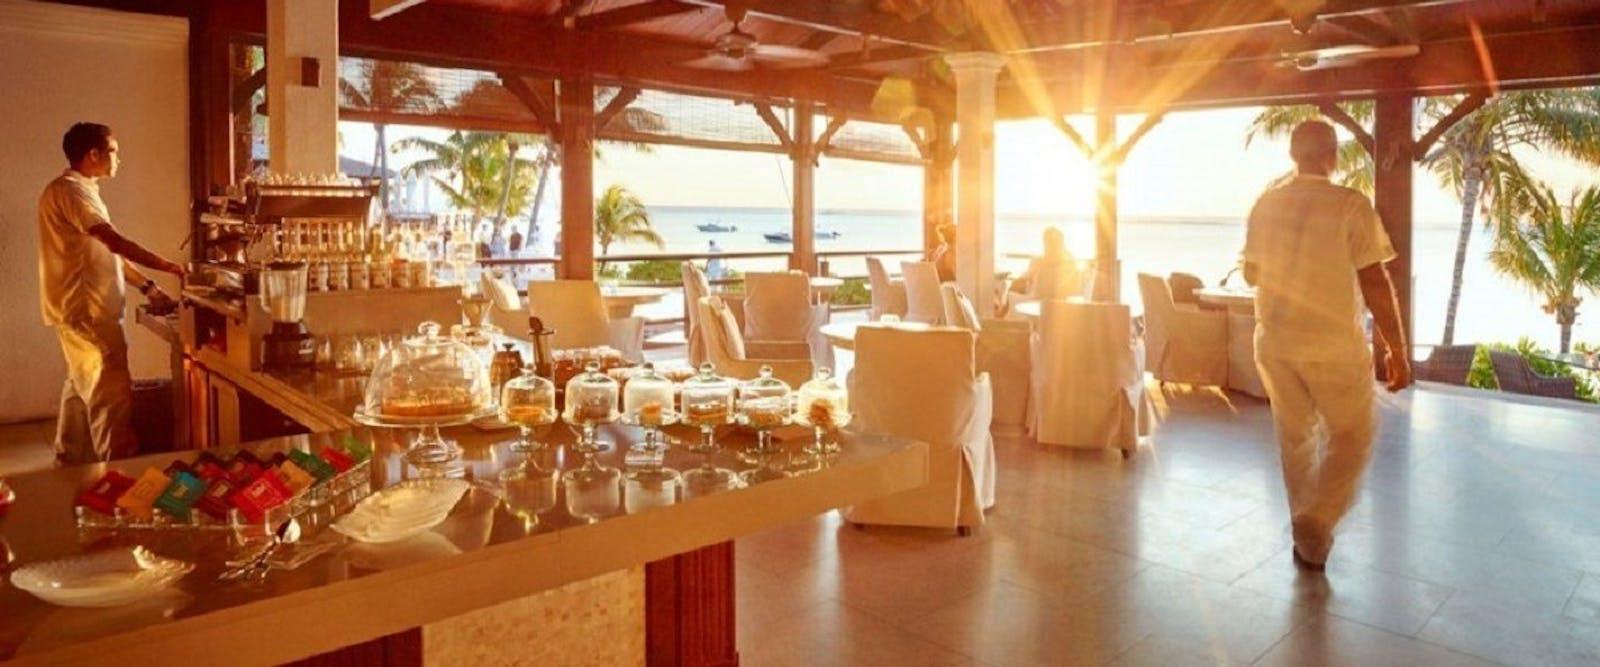 Lux Le Morne Mauritius World Renowned Luxury Hotel Afrika Et Tour Horseback Riding 8 12 Cafe At